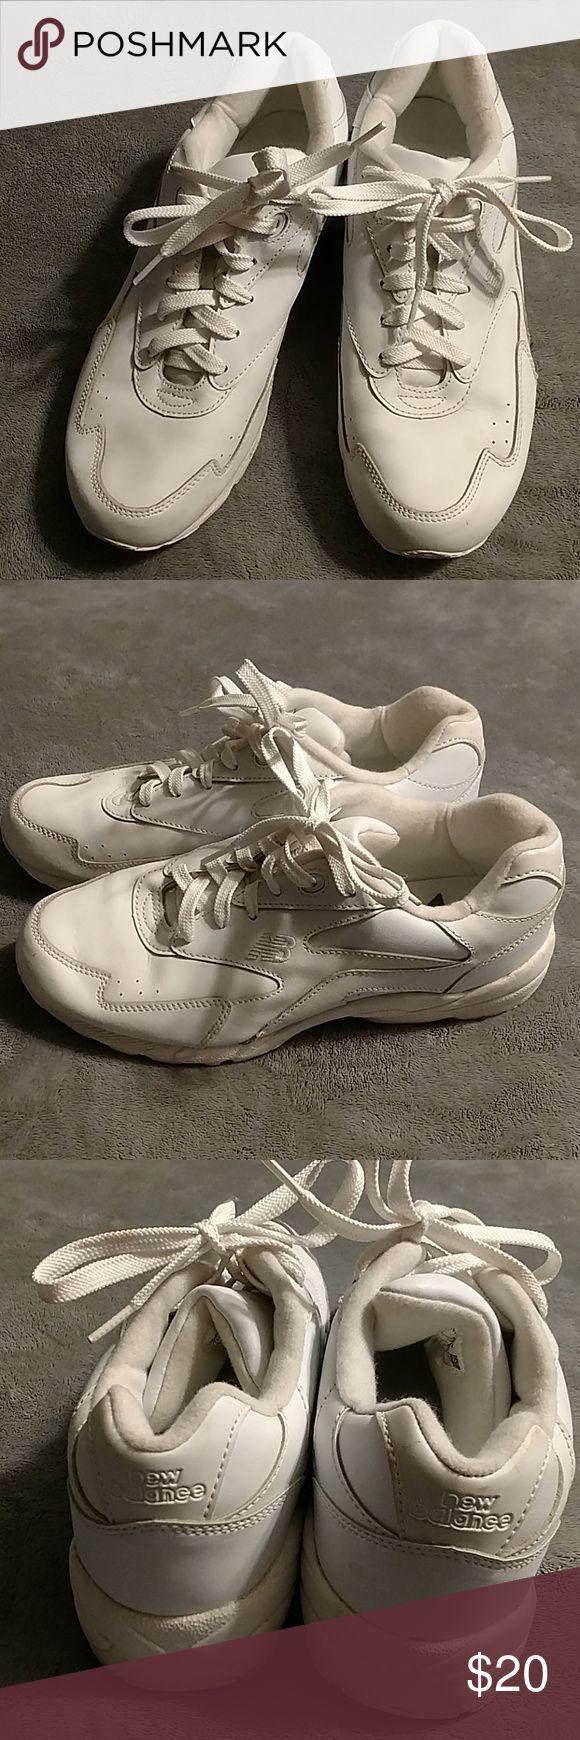 New Balance 335 shoes | New balance shoes, Shoes, Leather men